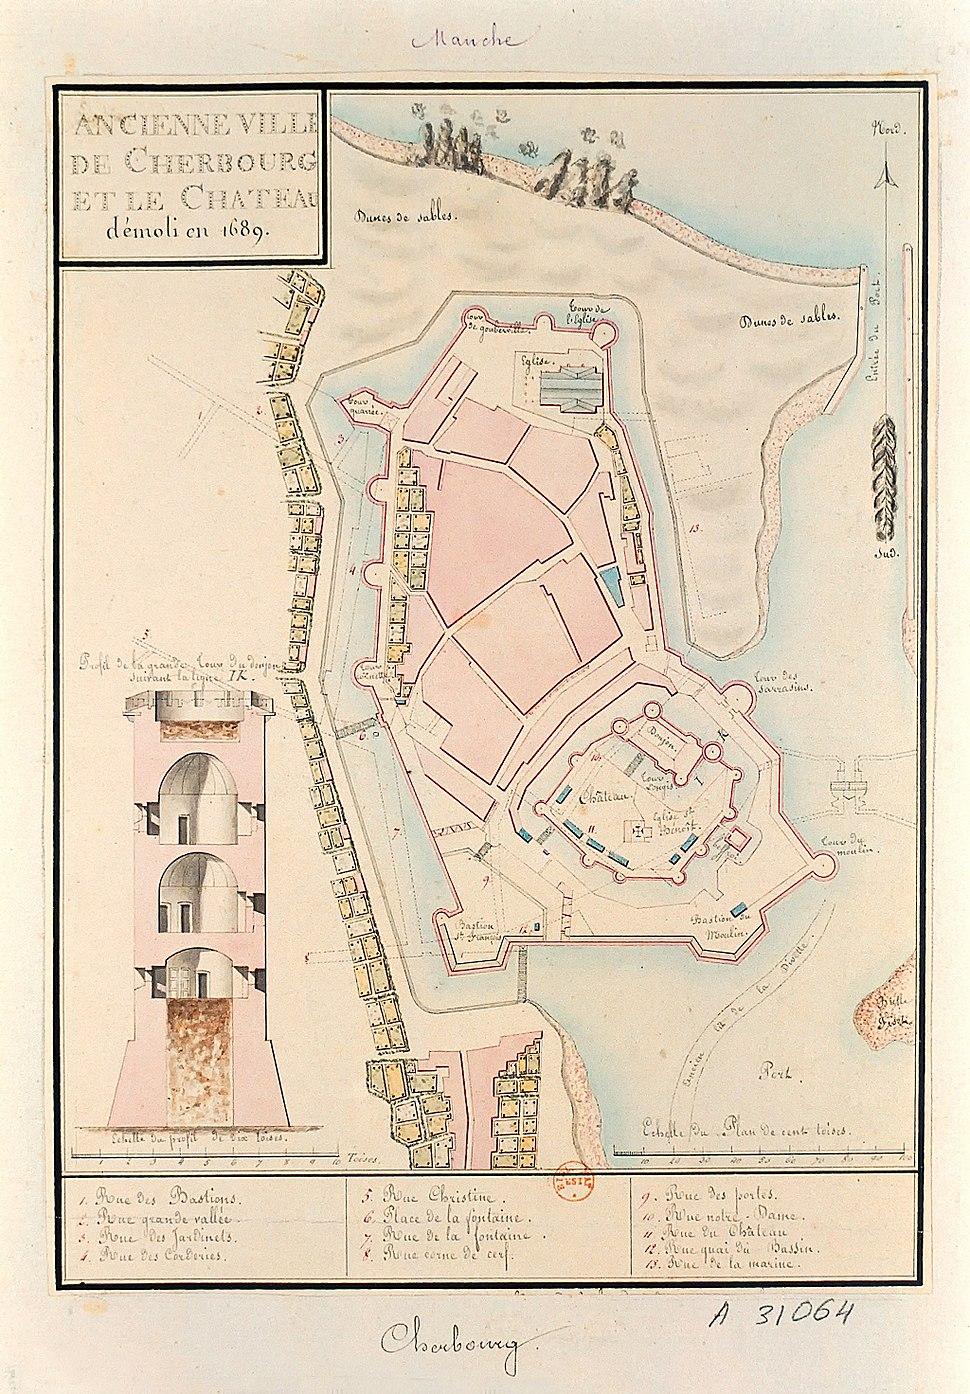 Chateau-cherbourg-1689b